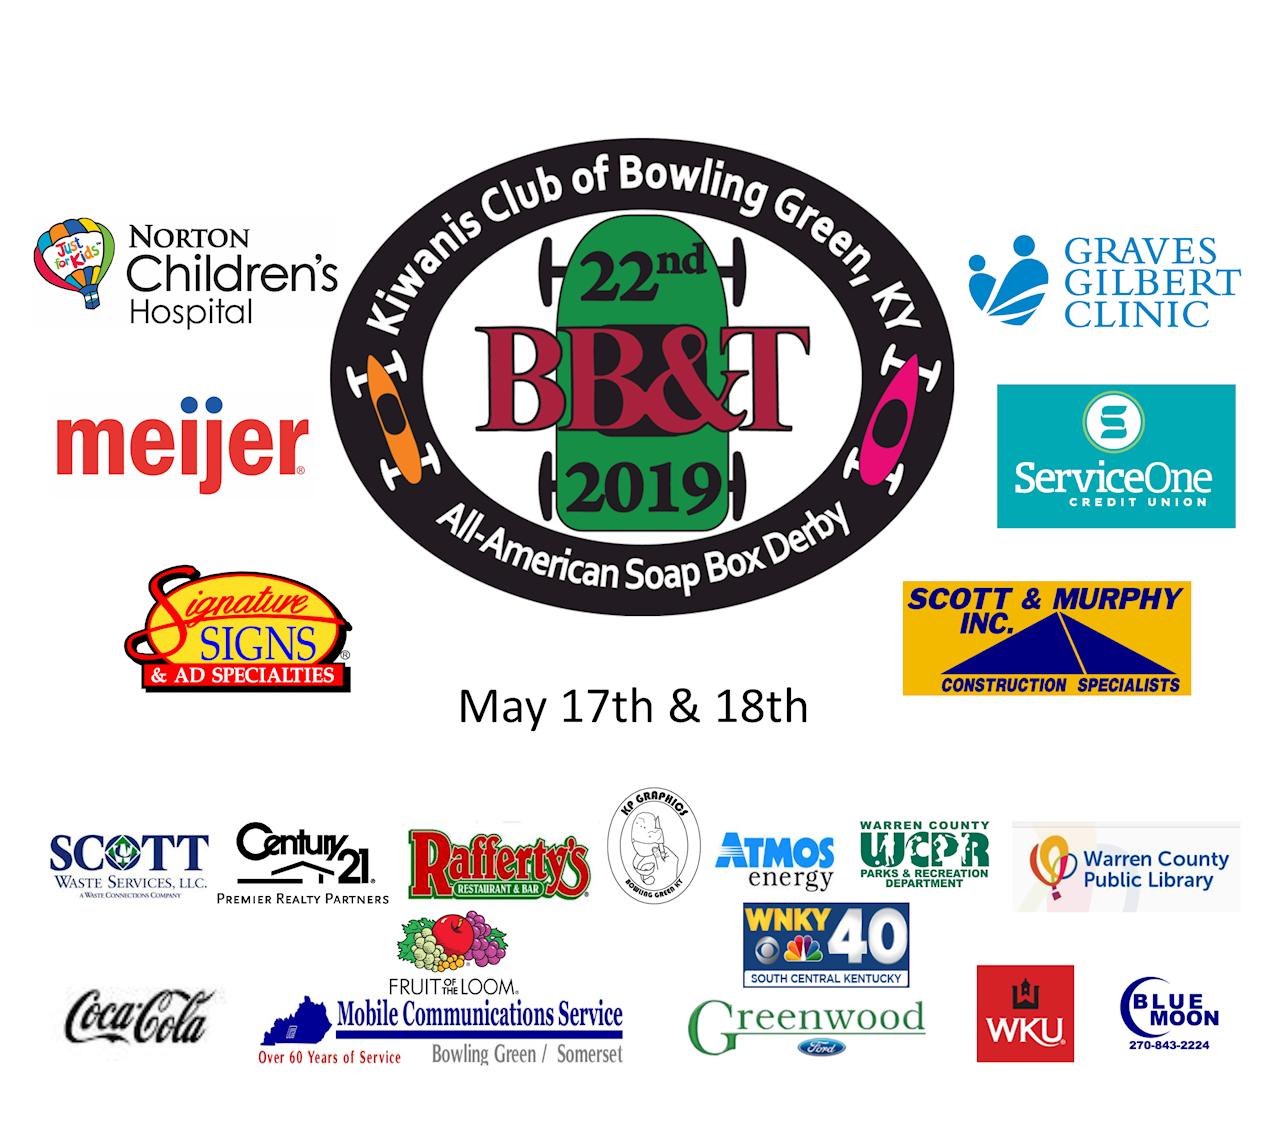 2019 Bb&t All-American Soap Box Derby - Graves Gilbert Clinic Bb&t Calendar 2019